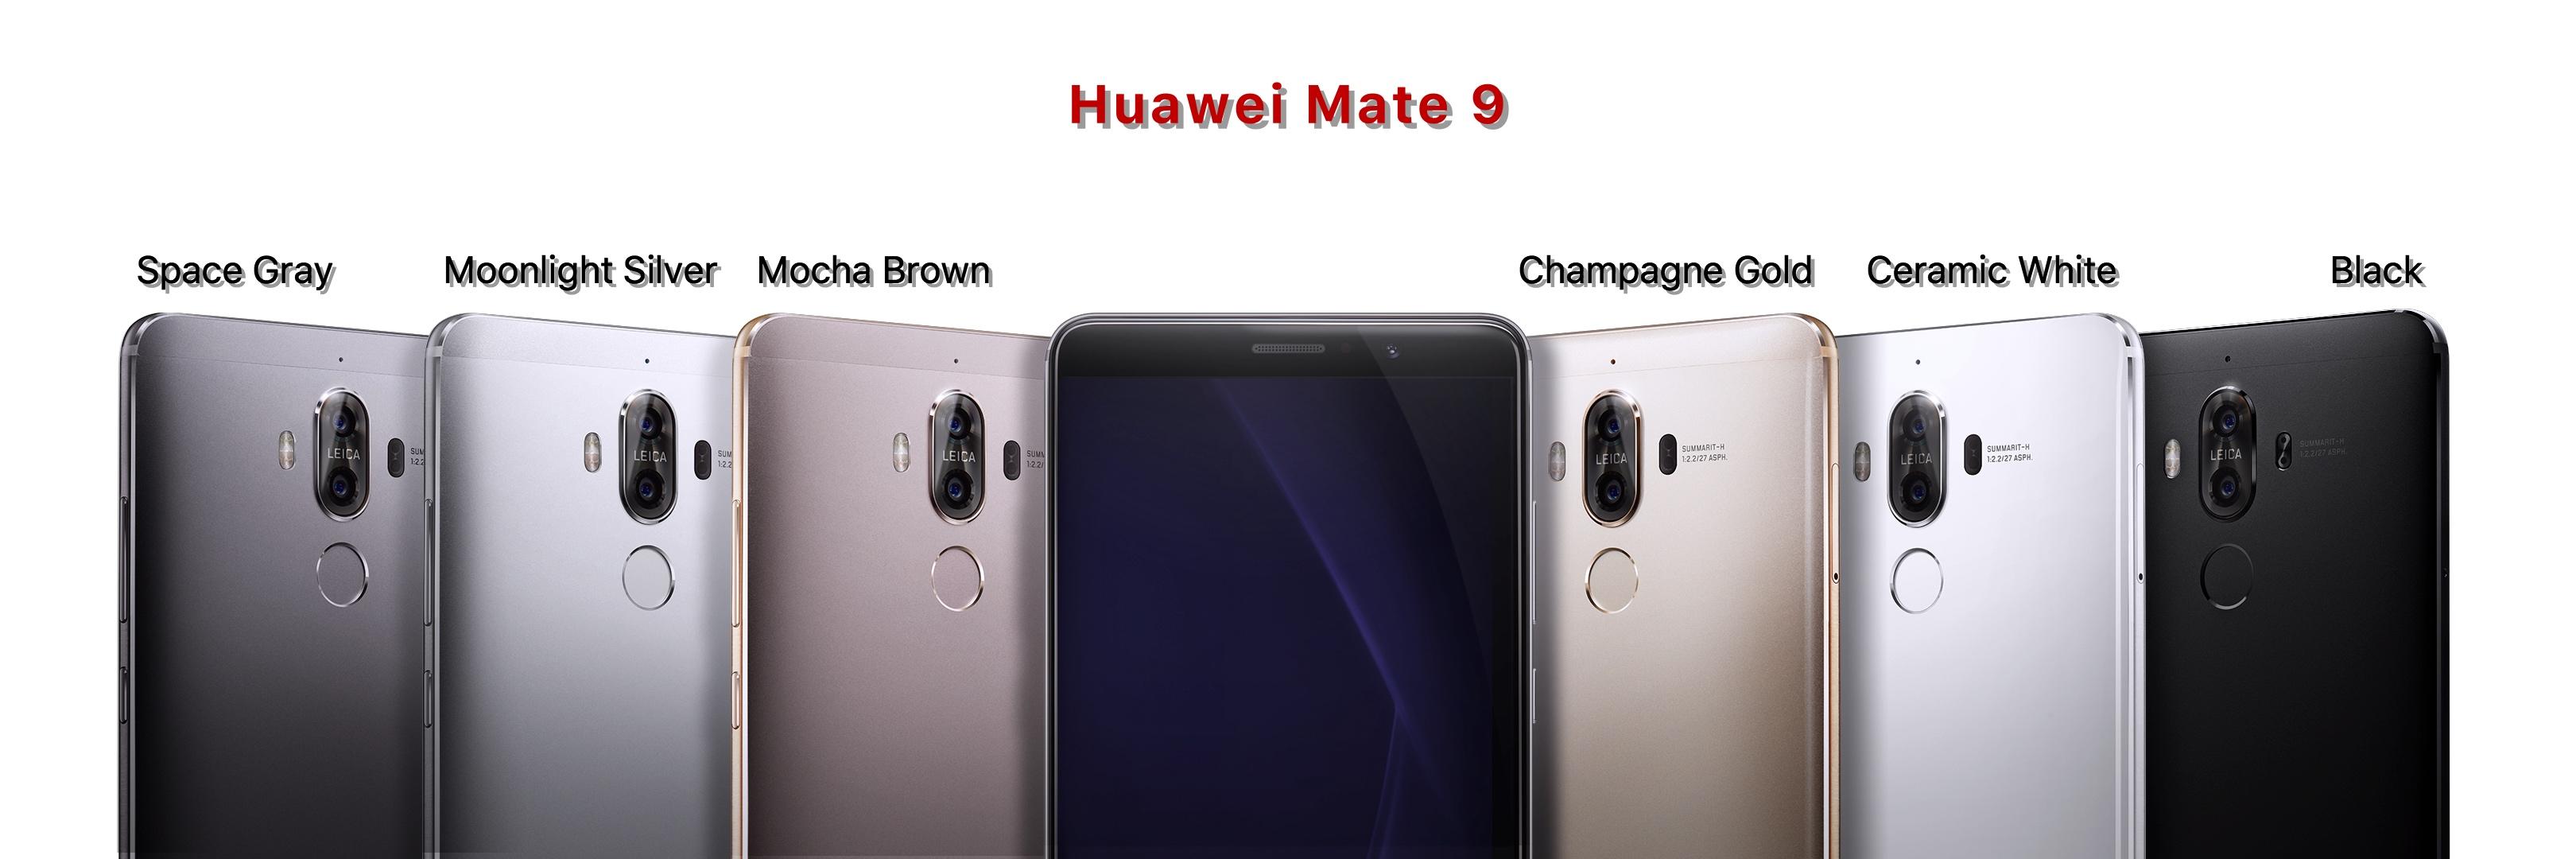 gama huawei mate 9